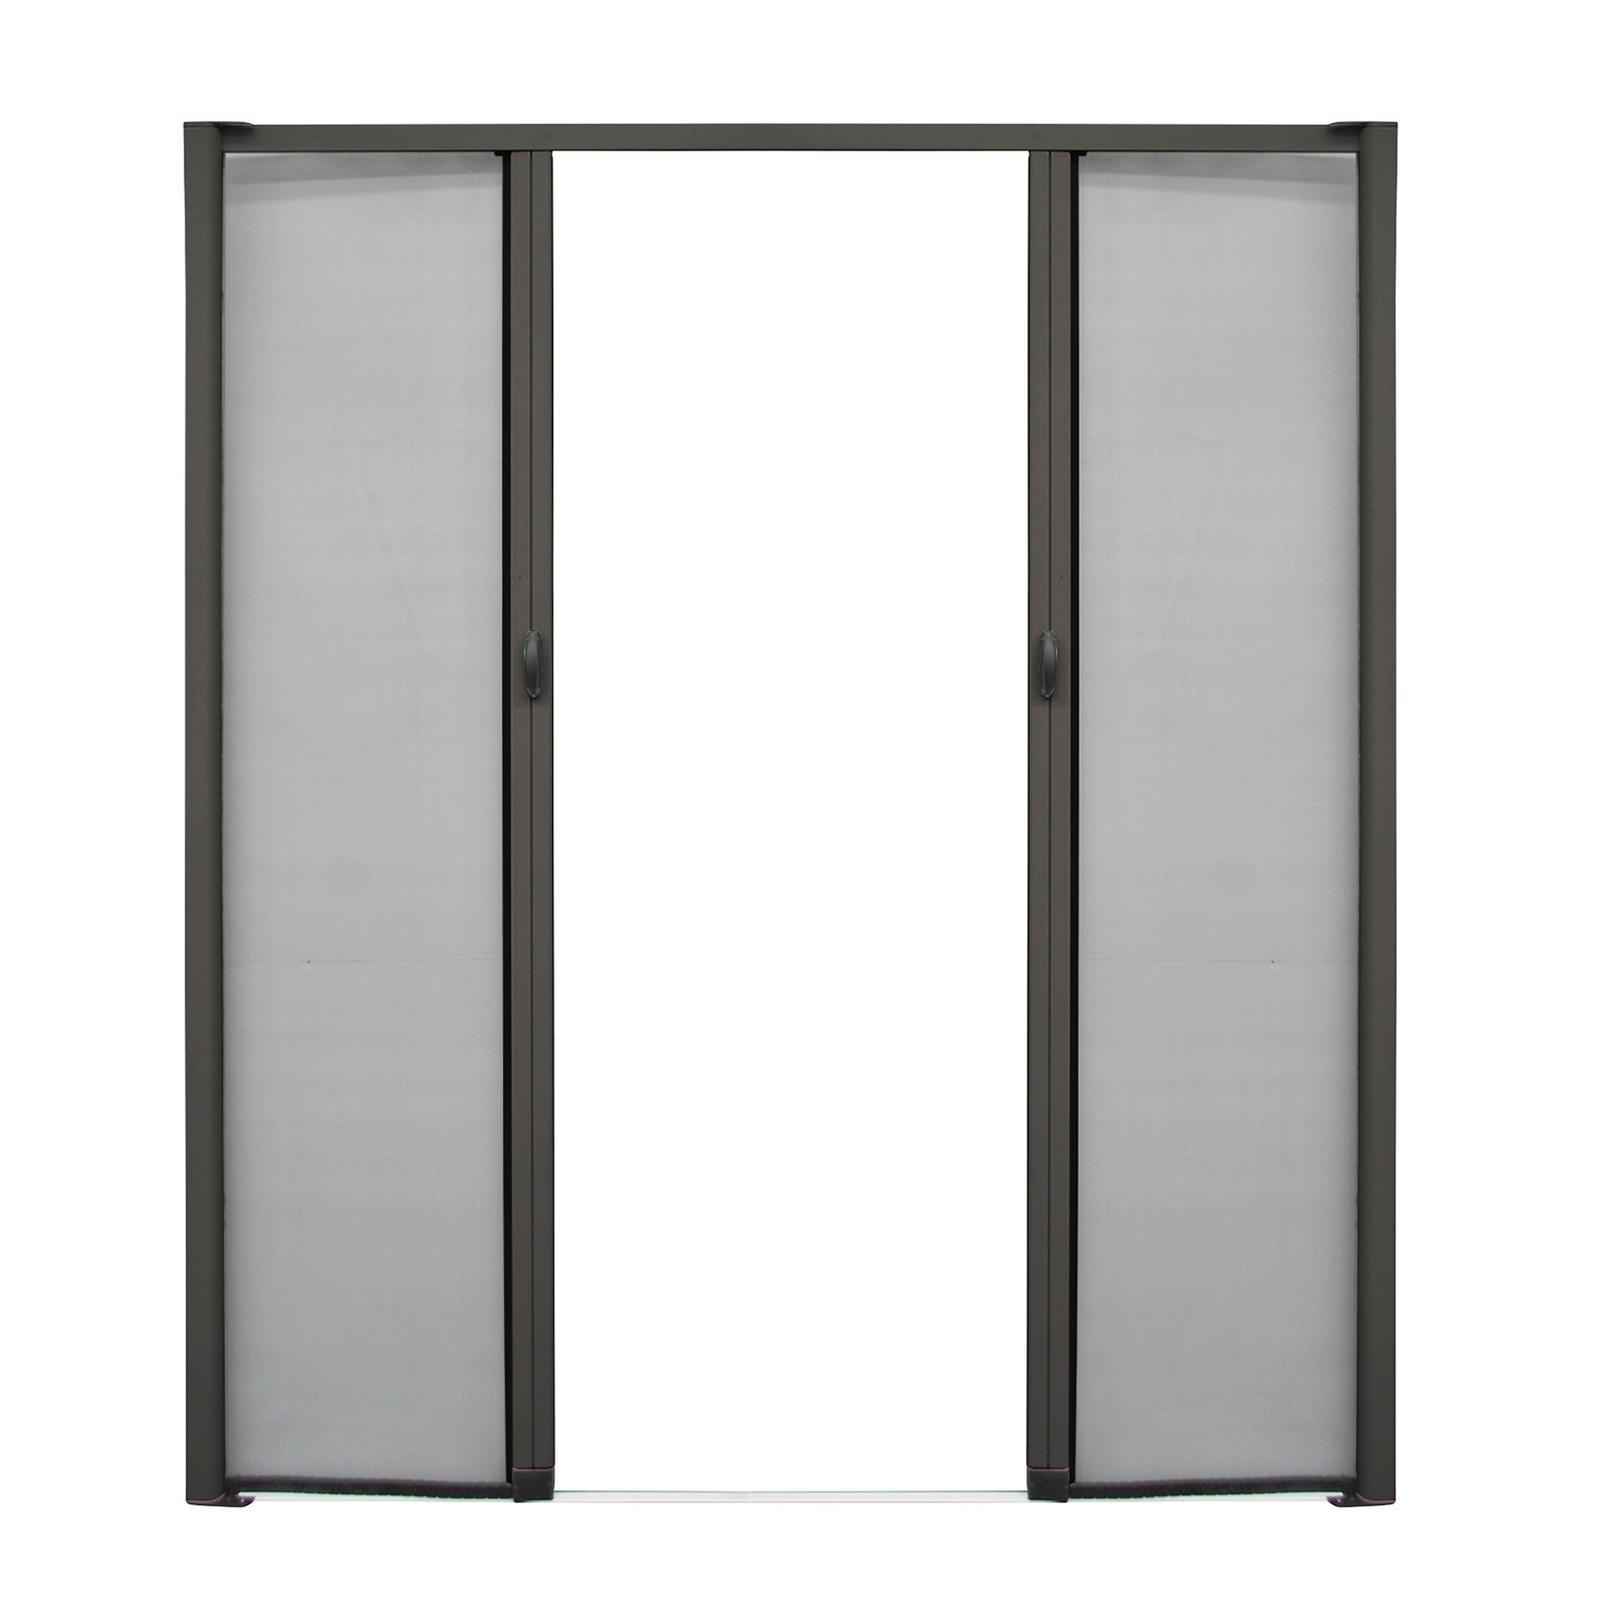 Pillar Products 210 x 204cm Charcoal Kakadu Retractable Flyscreen Door